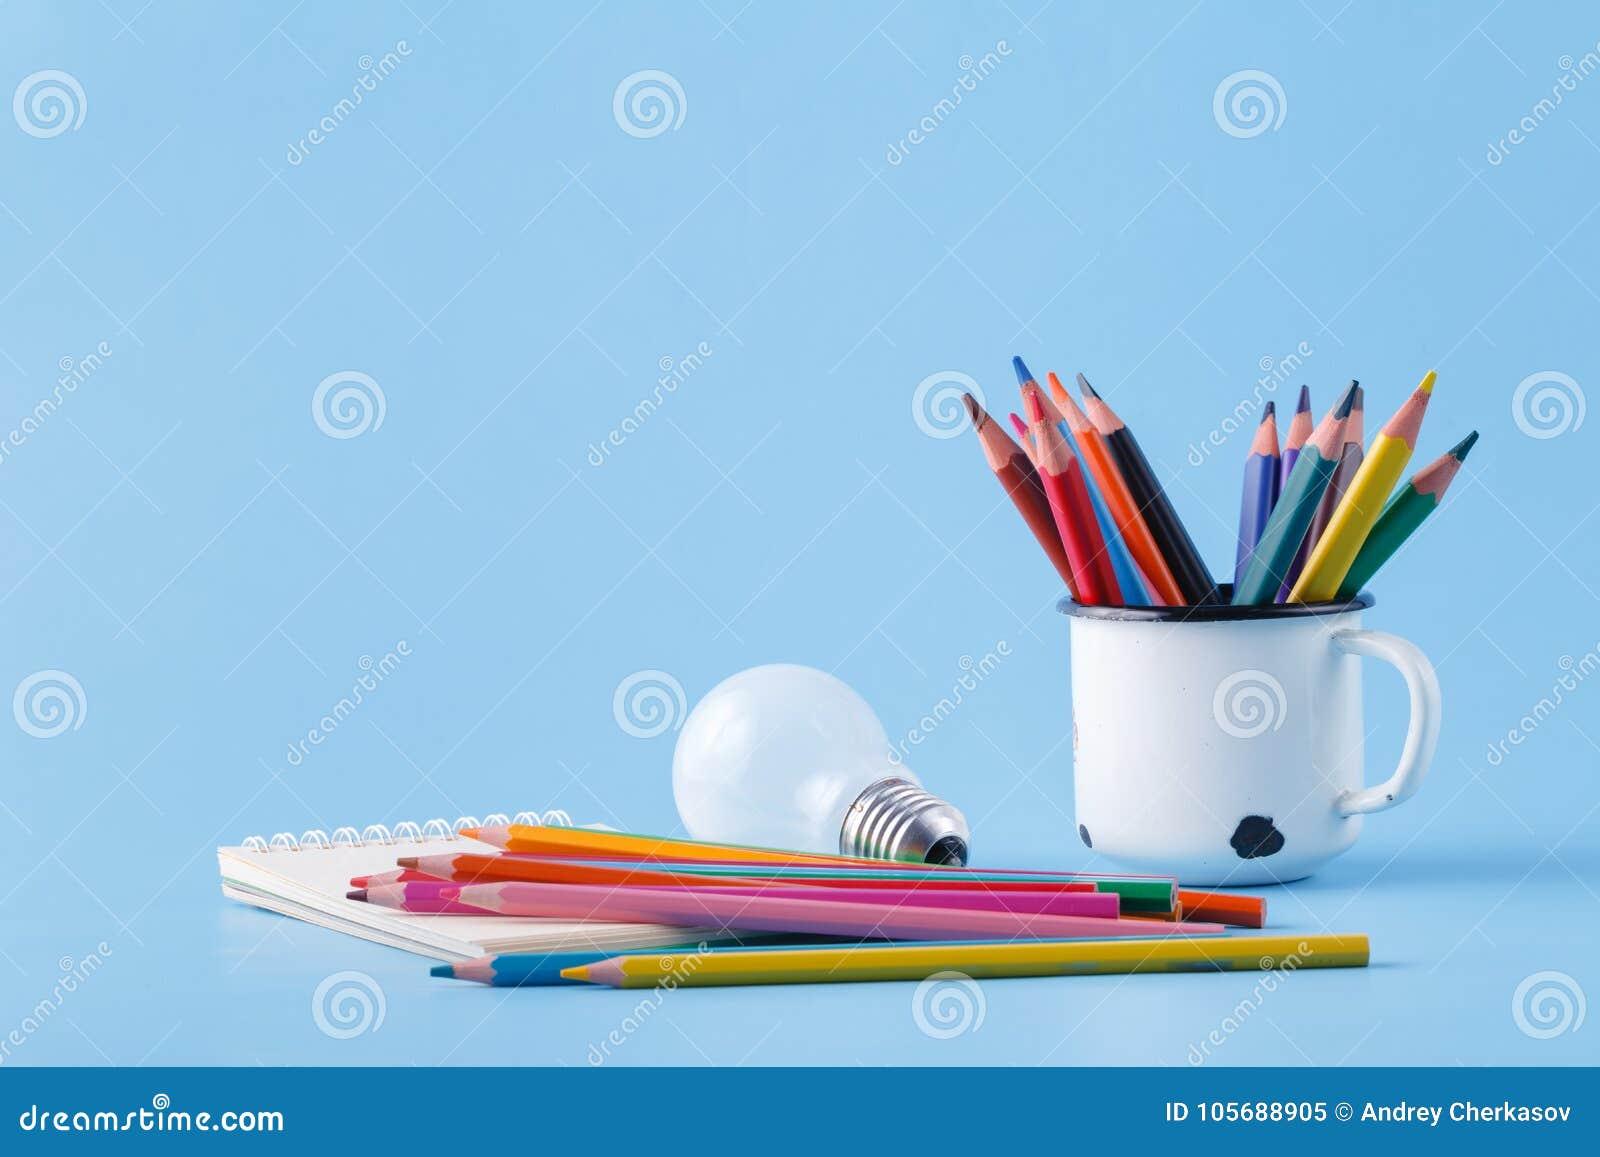 Pile of colour pencils on light blue background, creative idea c